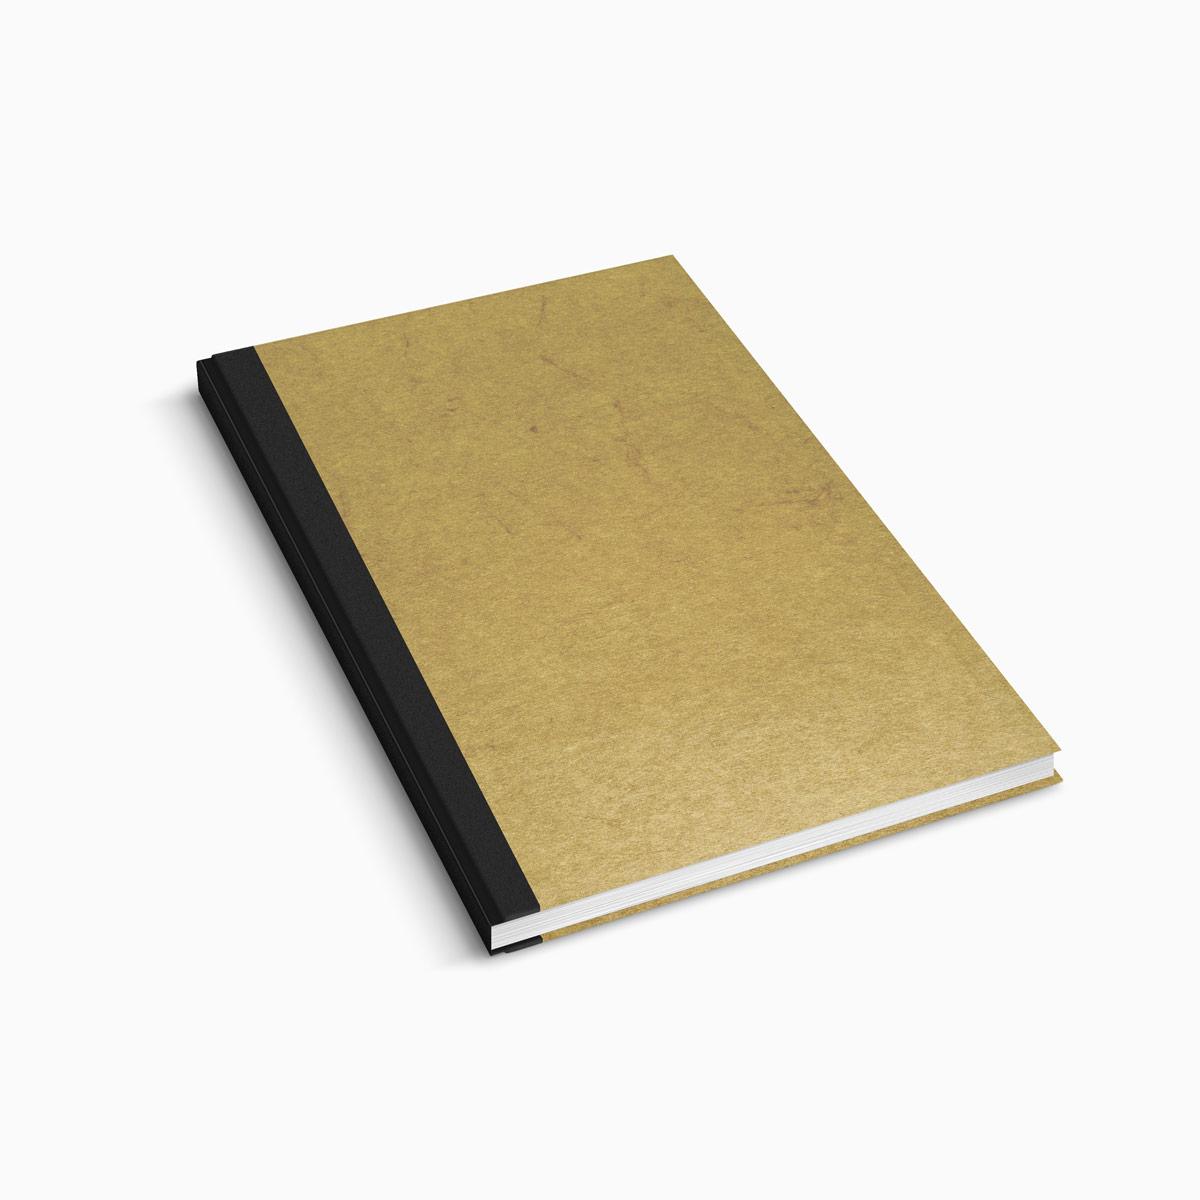 Hardcover Basic - Beige